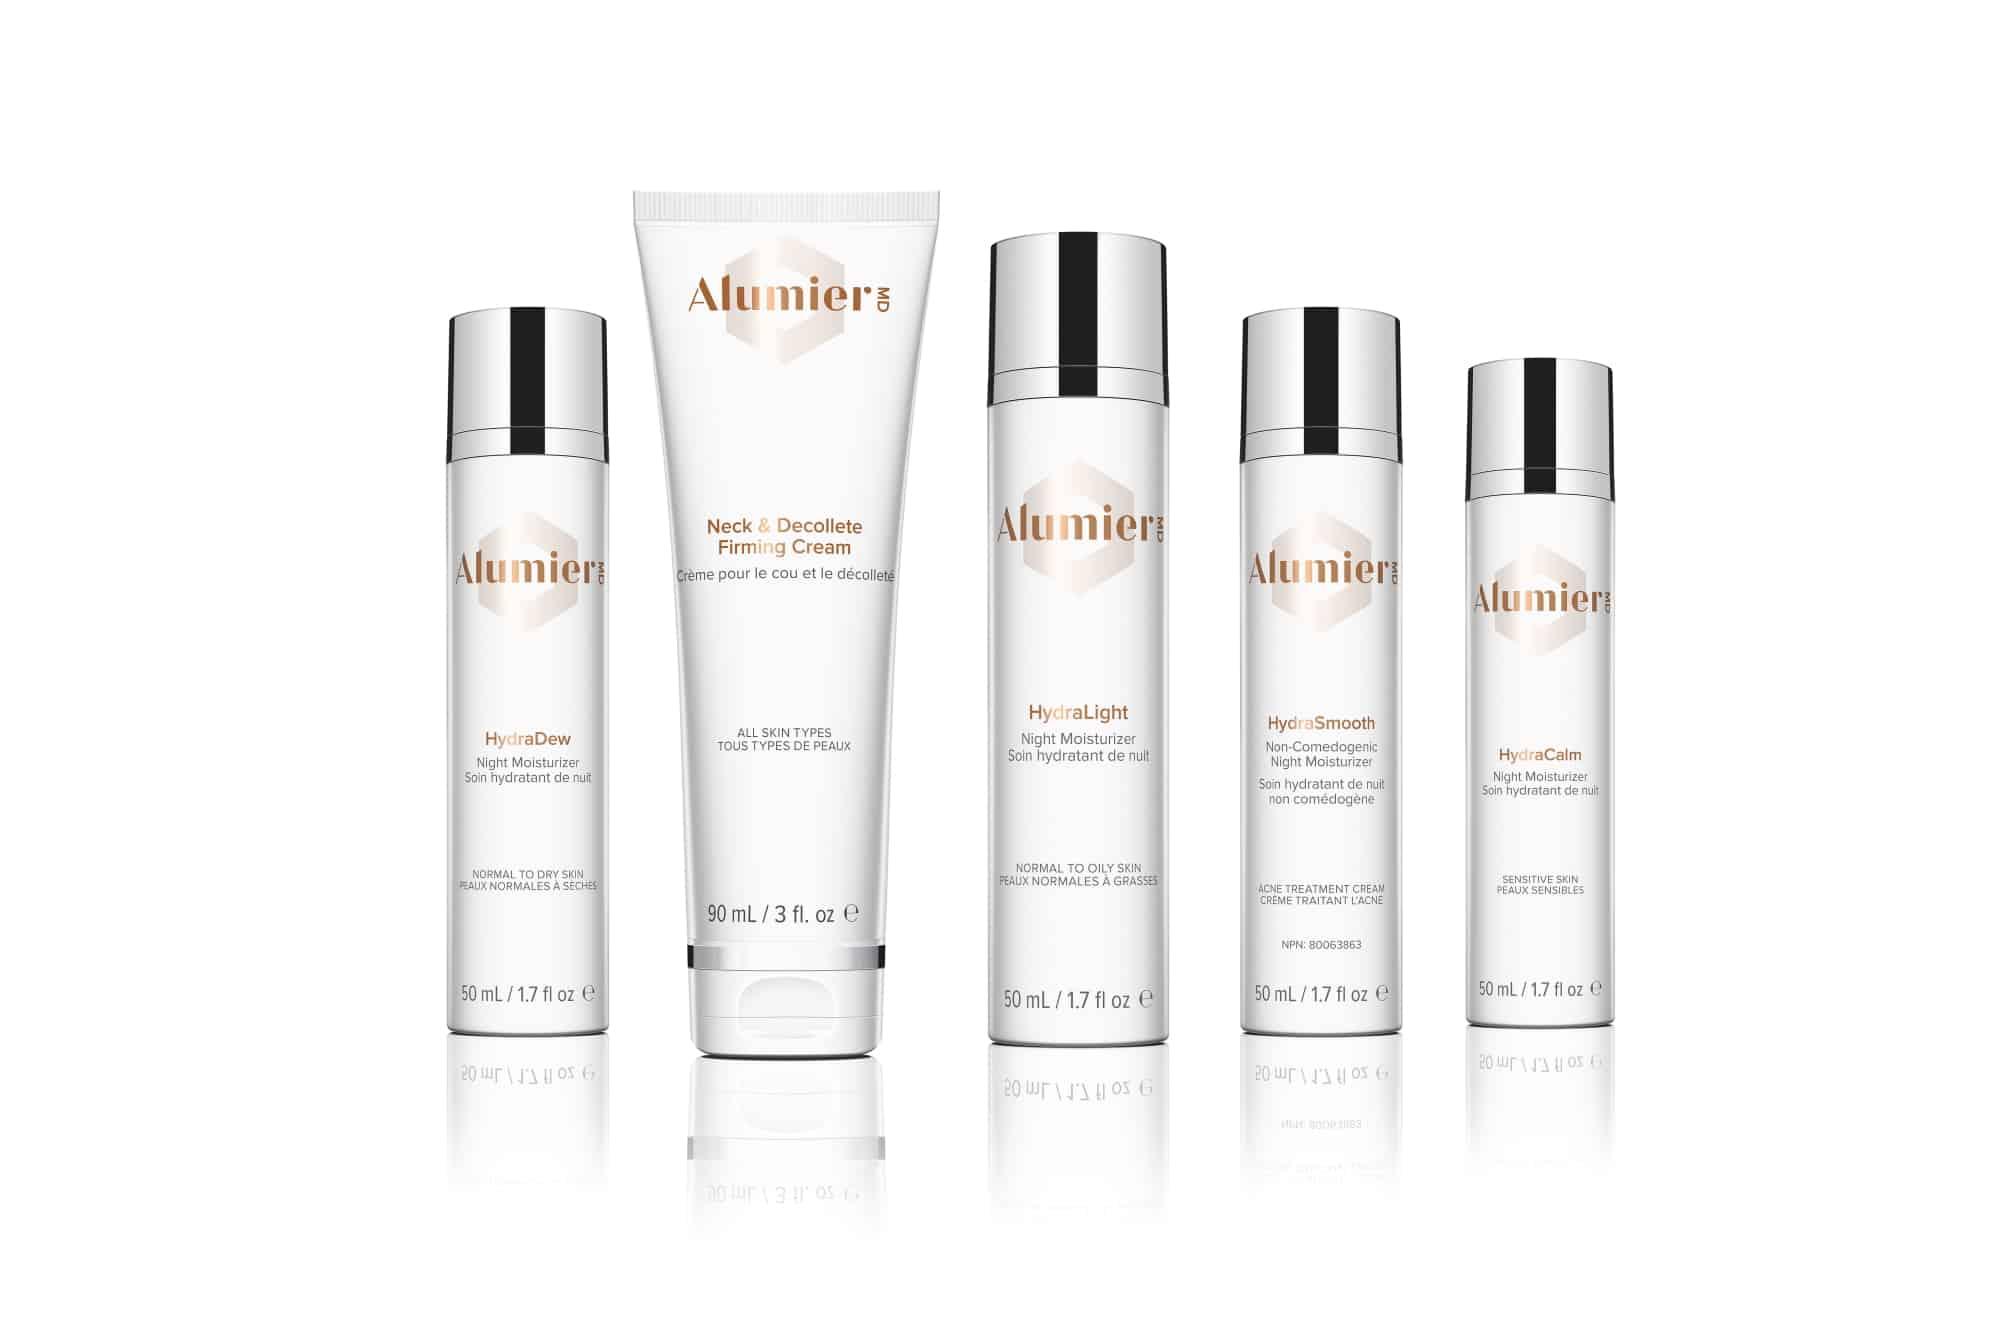 AlumierMD moisturizers